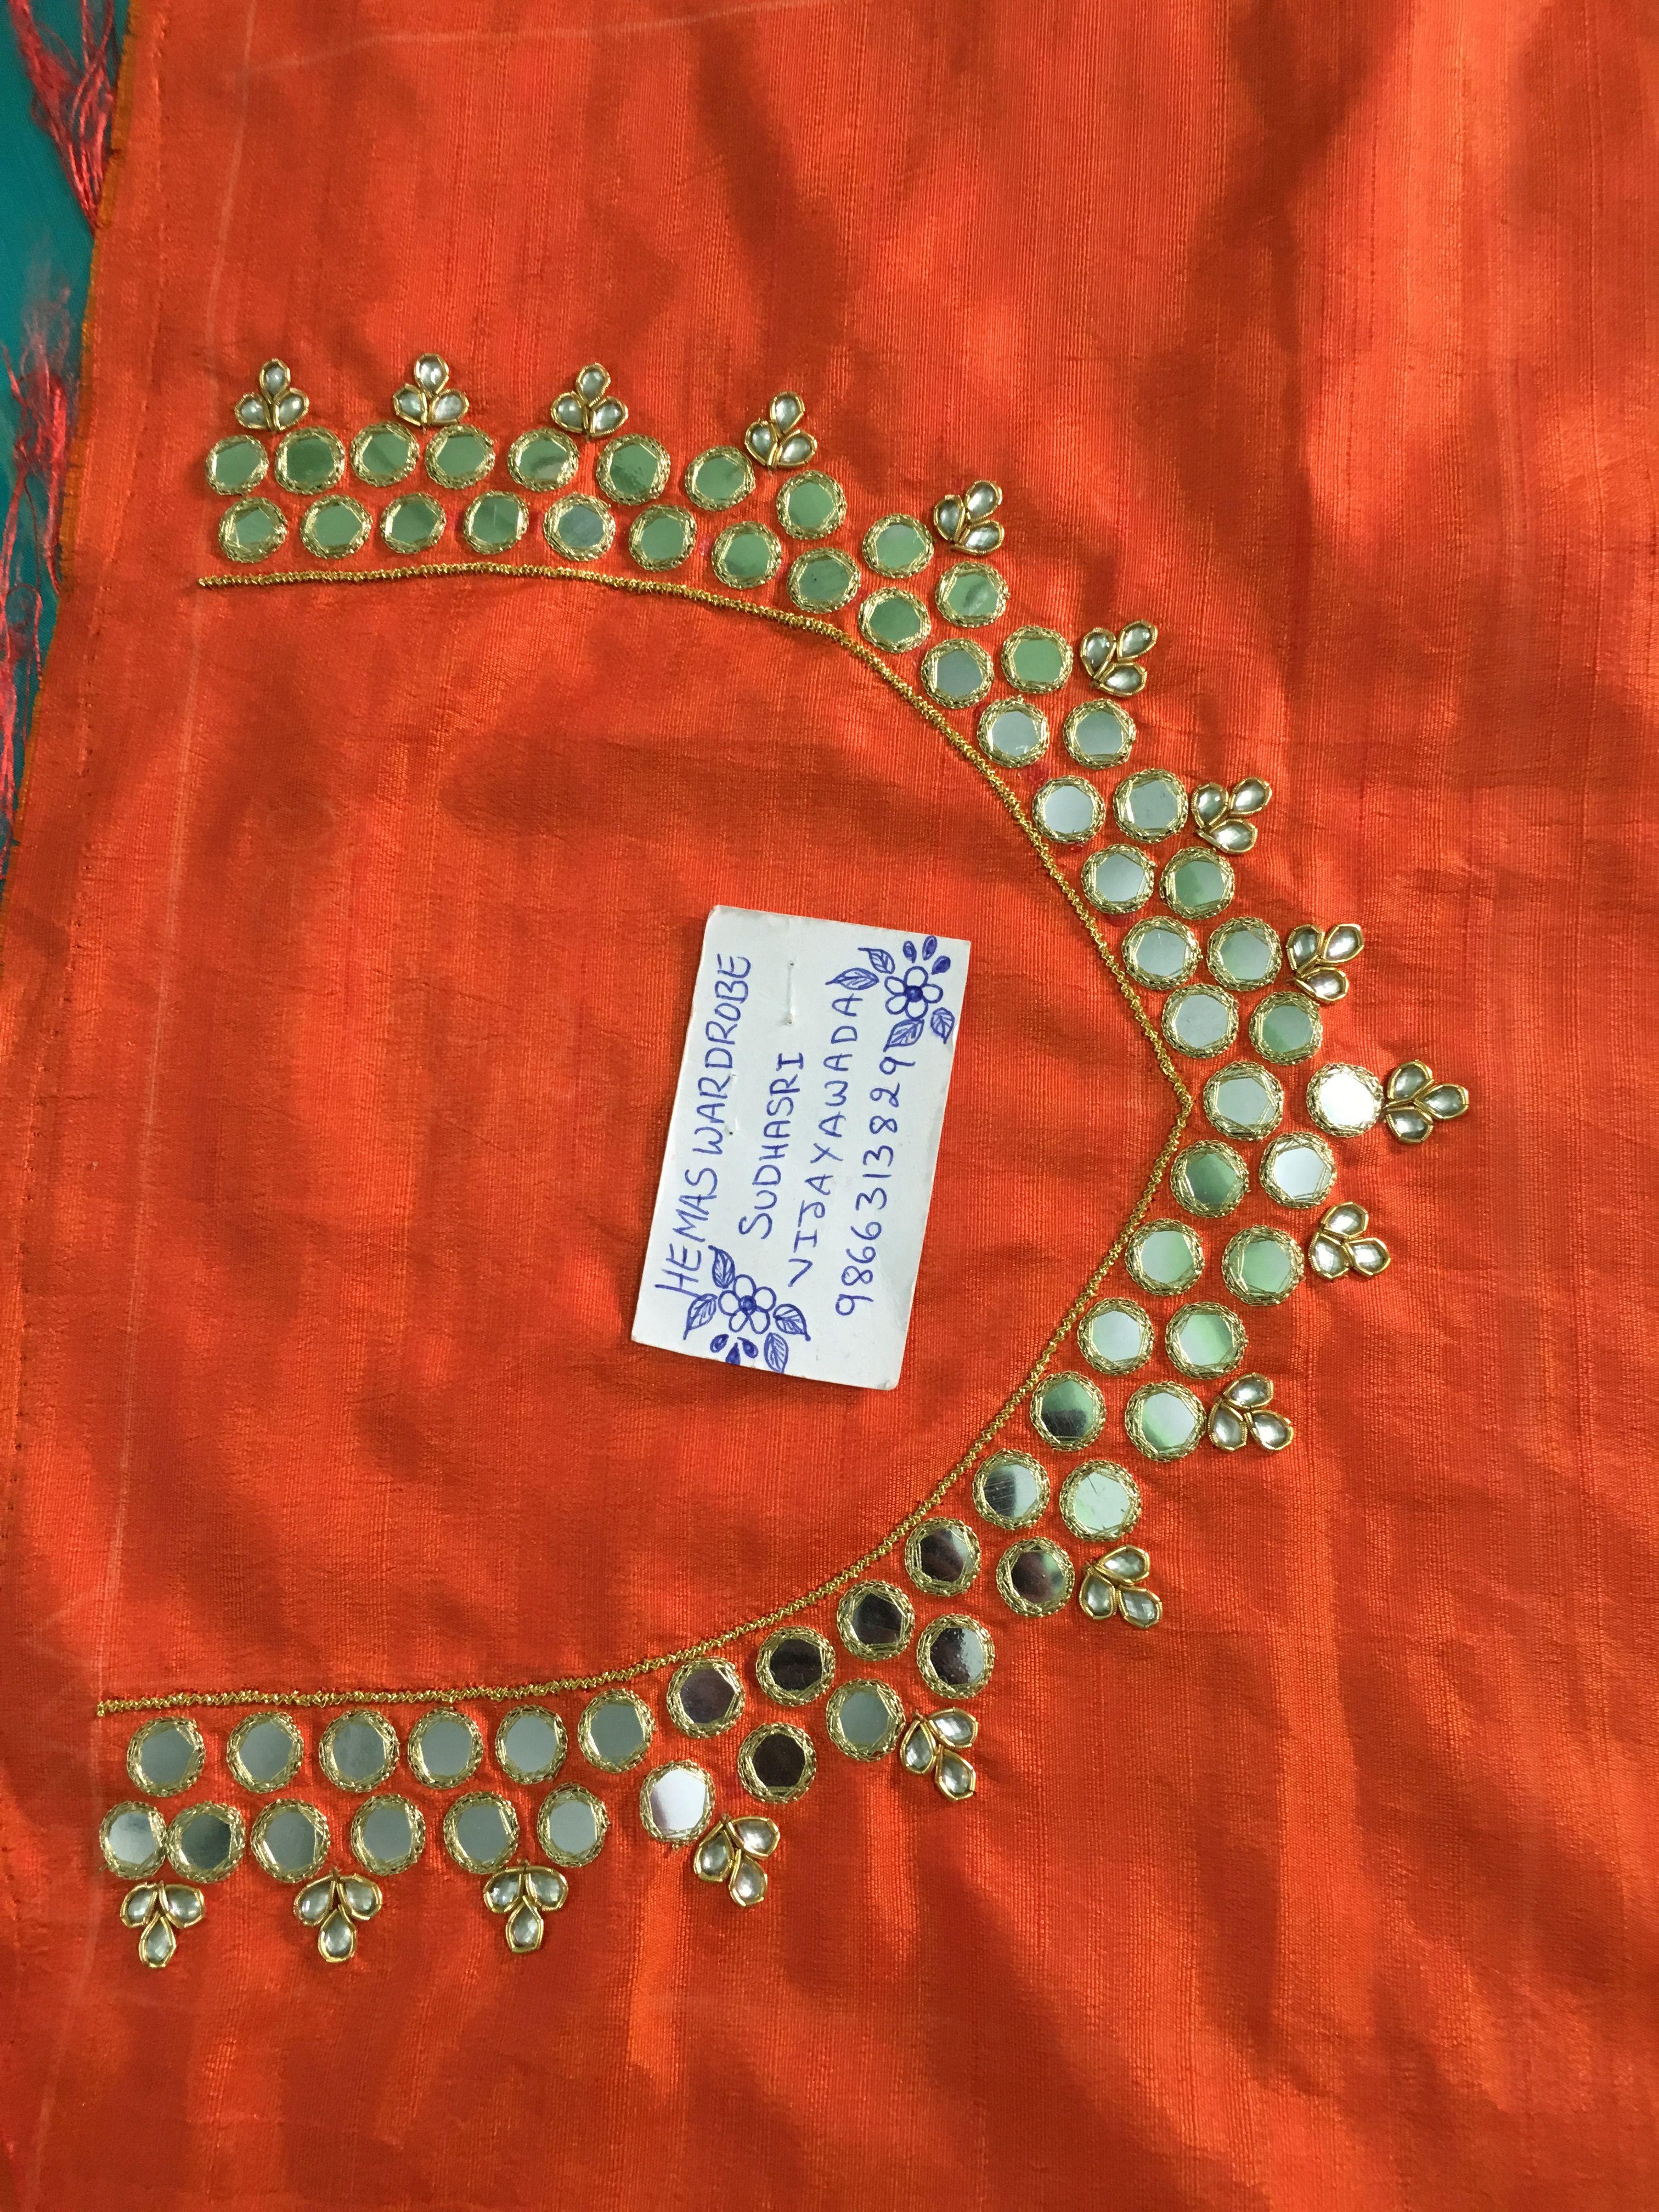 Pin de Siva Flower en details in fabric   Pinterest